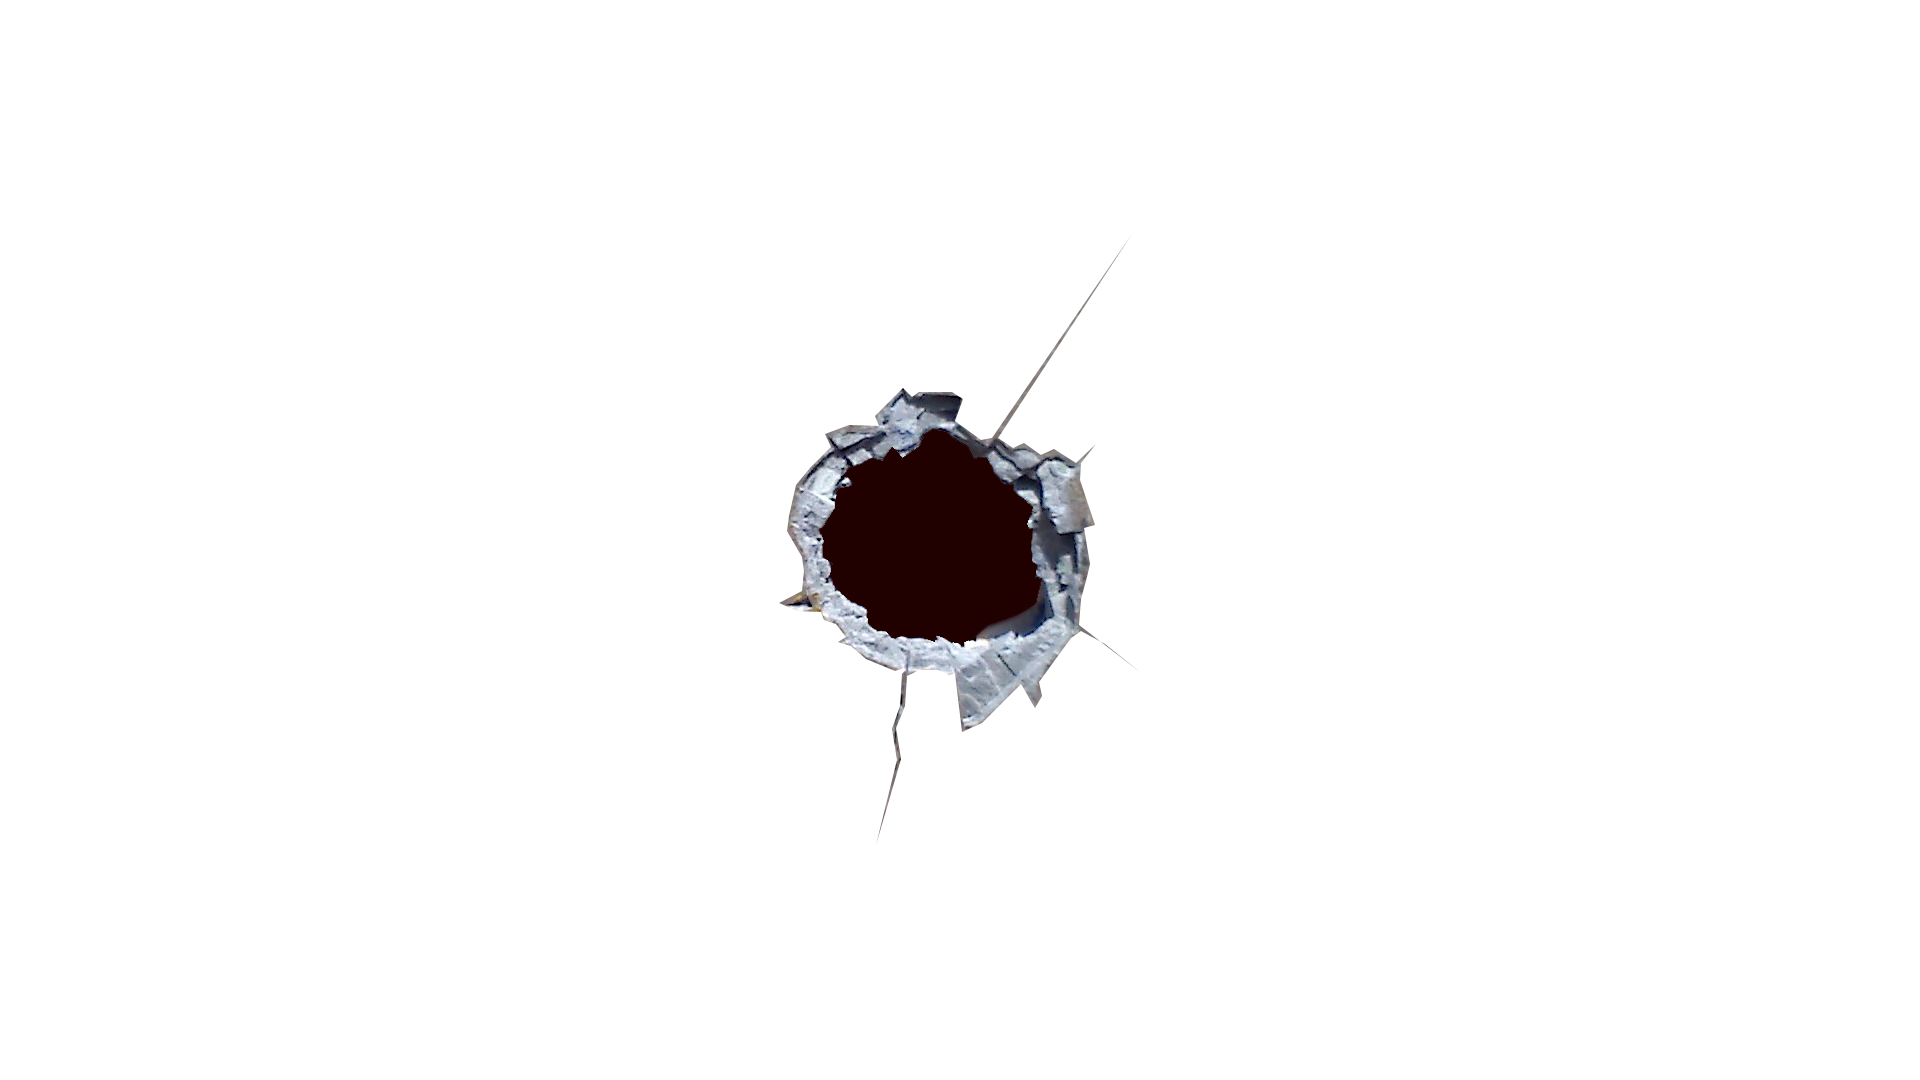 Gunshot Png Images Transparent Free Download Pngmart Com Bullet Holes Image Gunshot